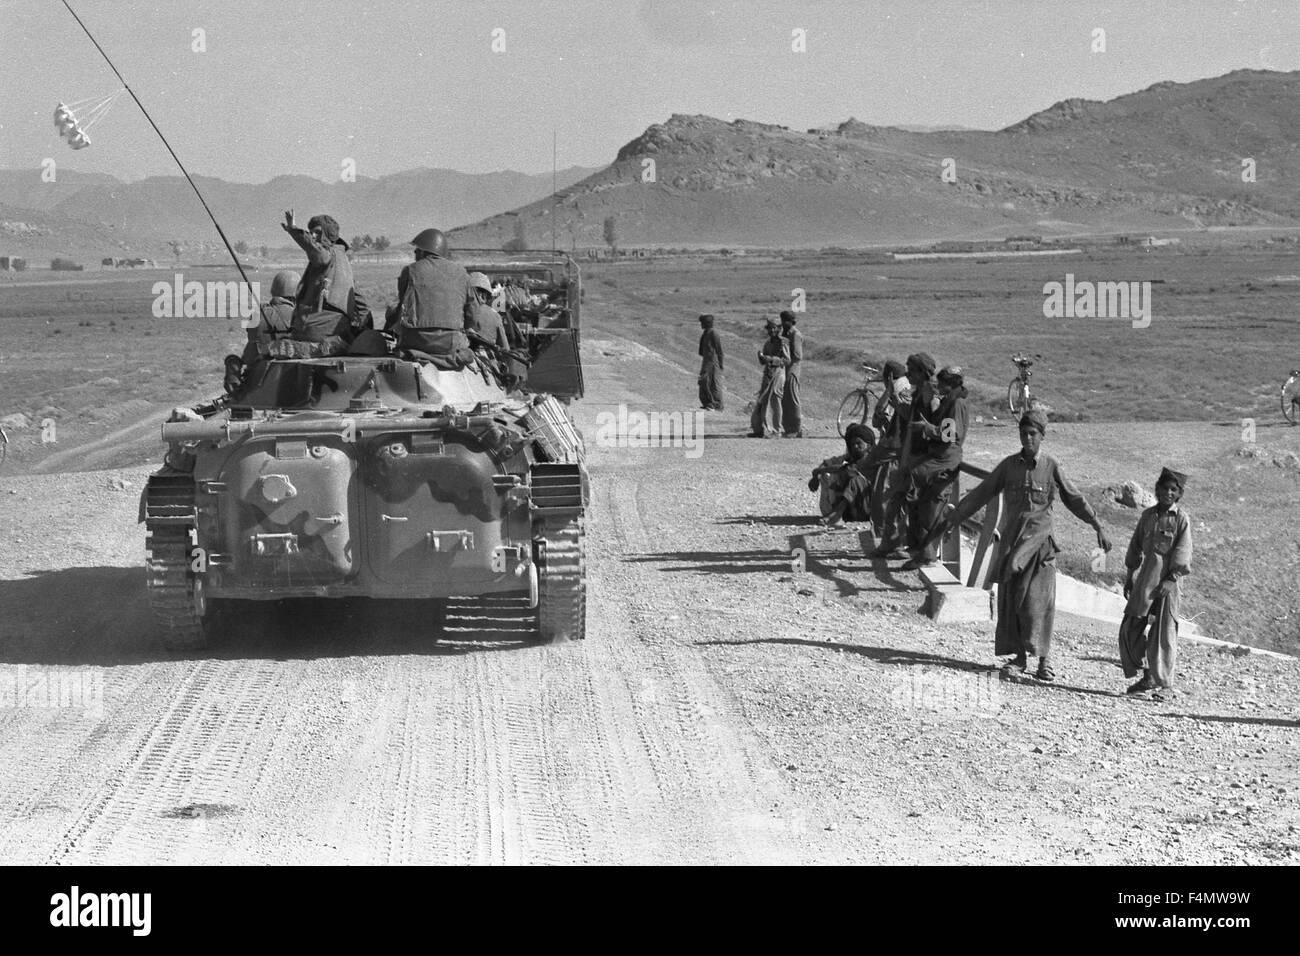 Soviet Afghanistan war - Page 6 Afghanistan-the-soviet-military-technics-on-road-to-kandahar-F4MW9W